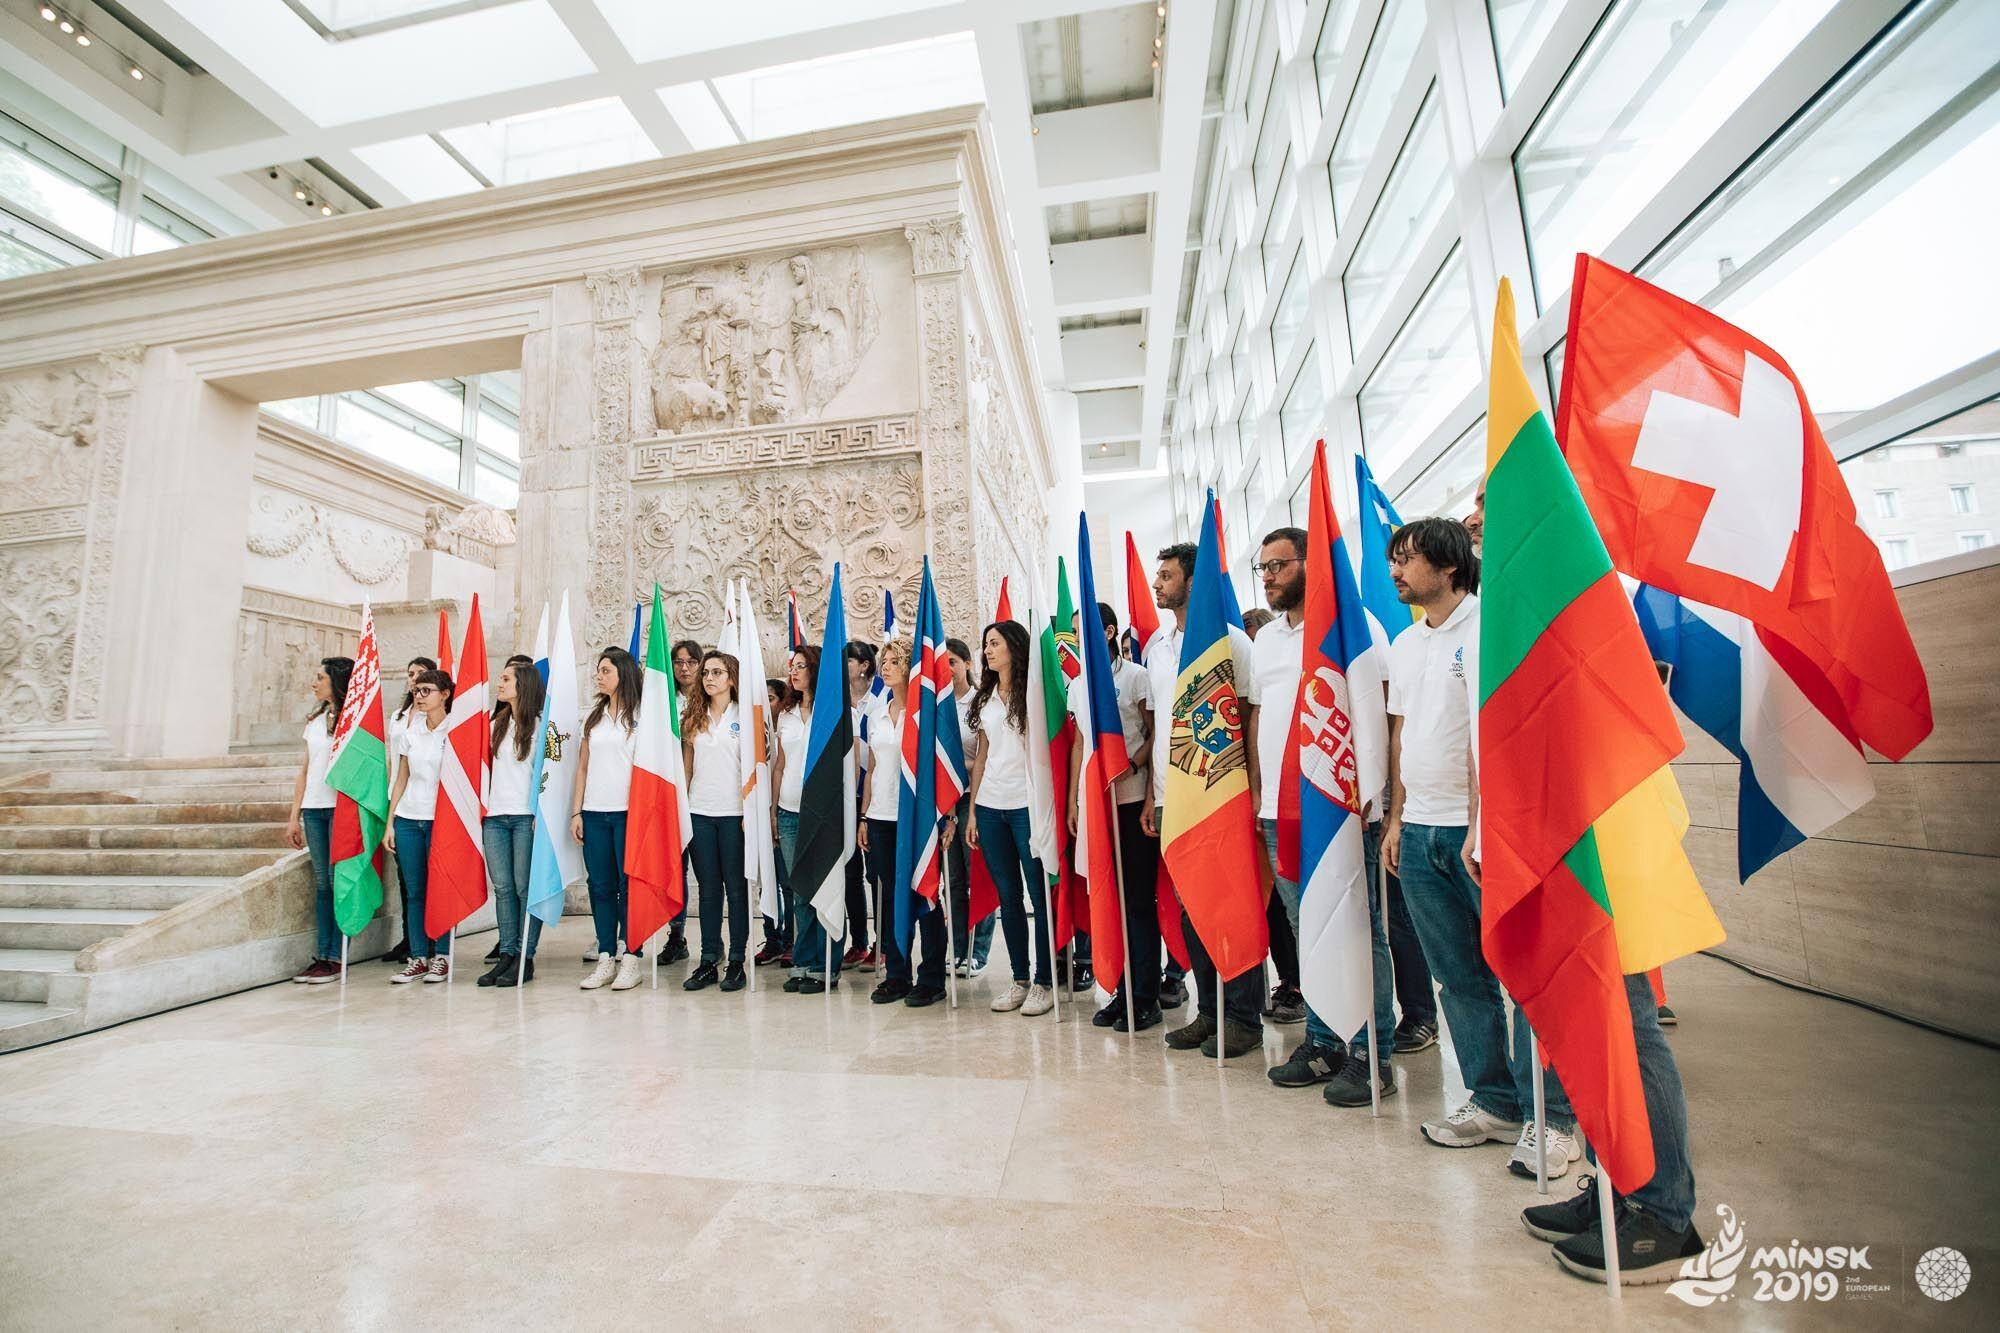 Flag bearers at Ara Pacis in Rome ©Minsk 2019